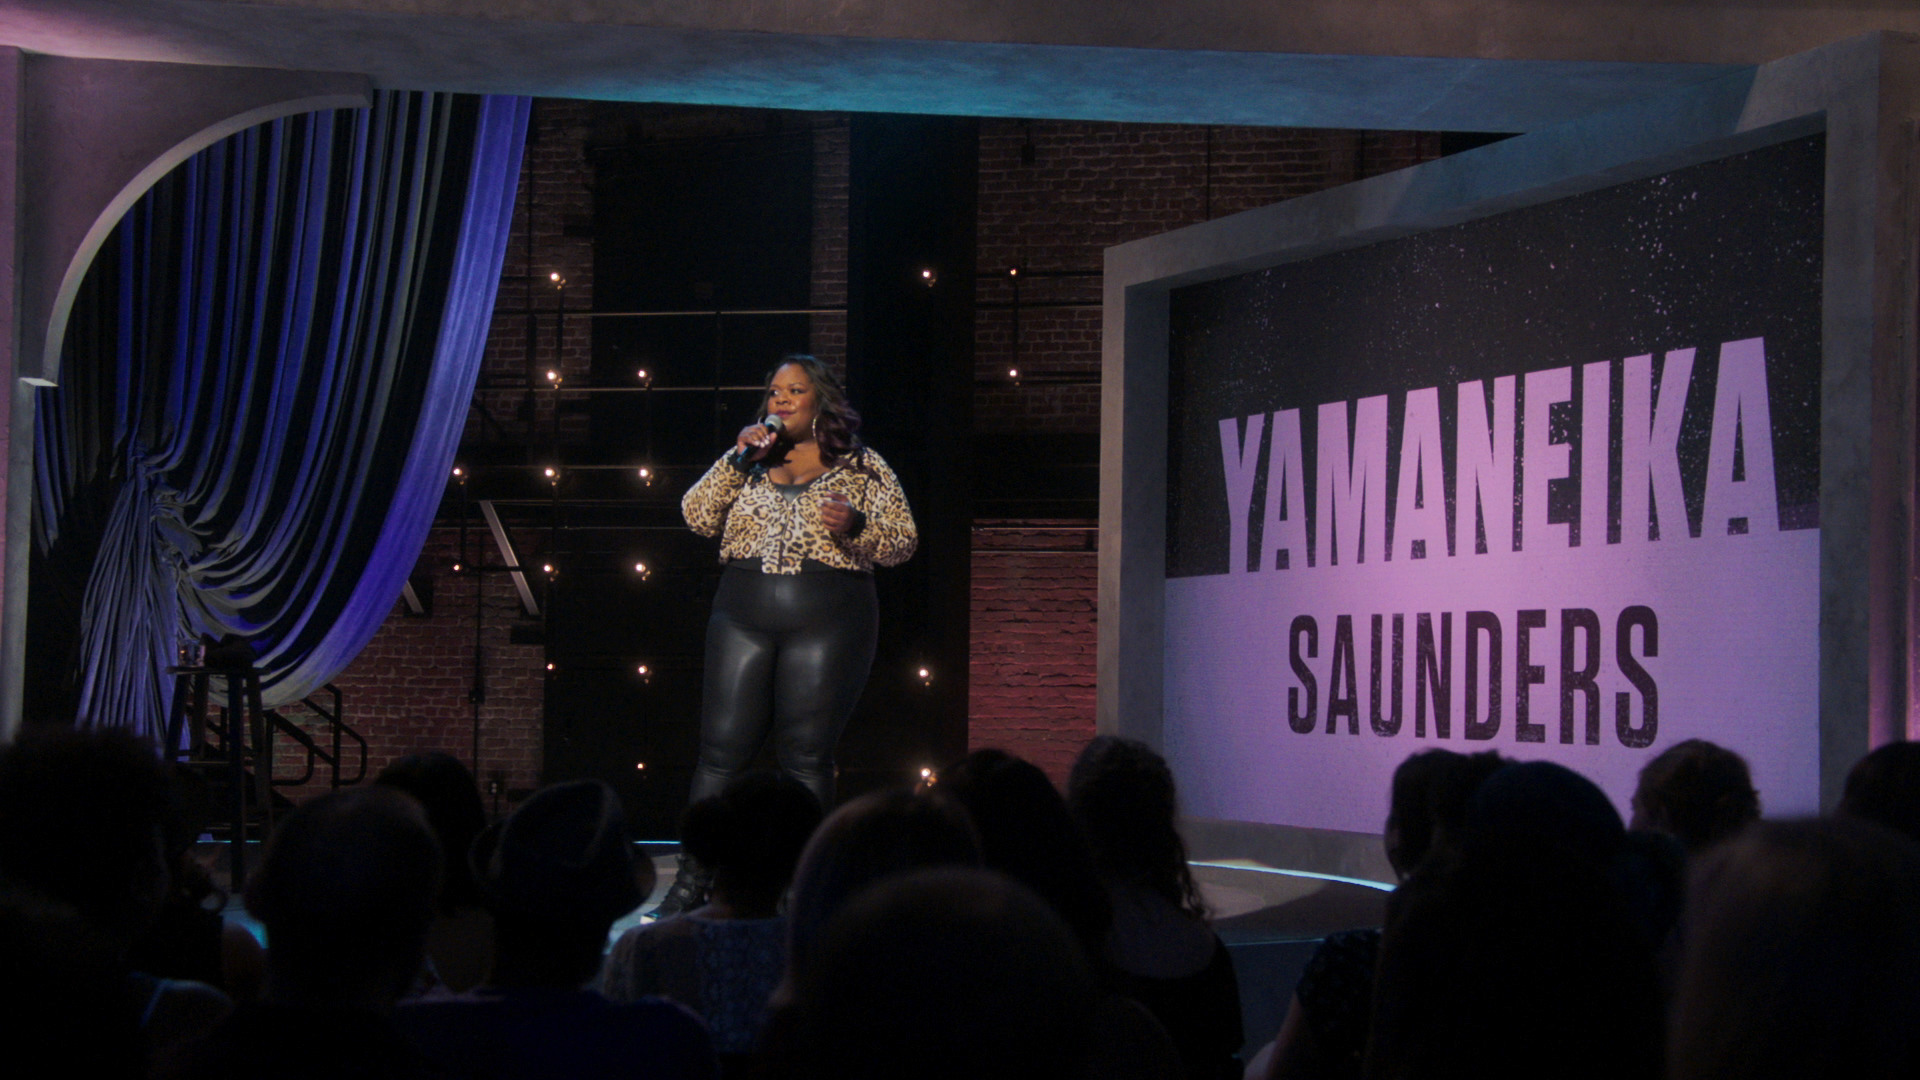 Yamaneika Saunders